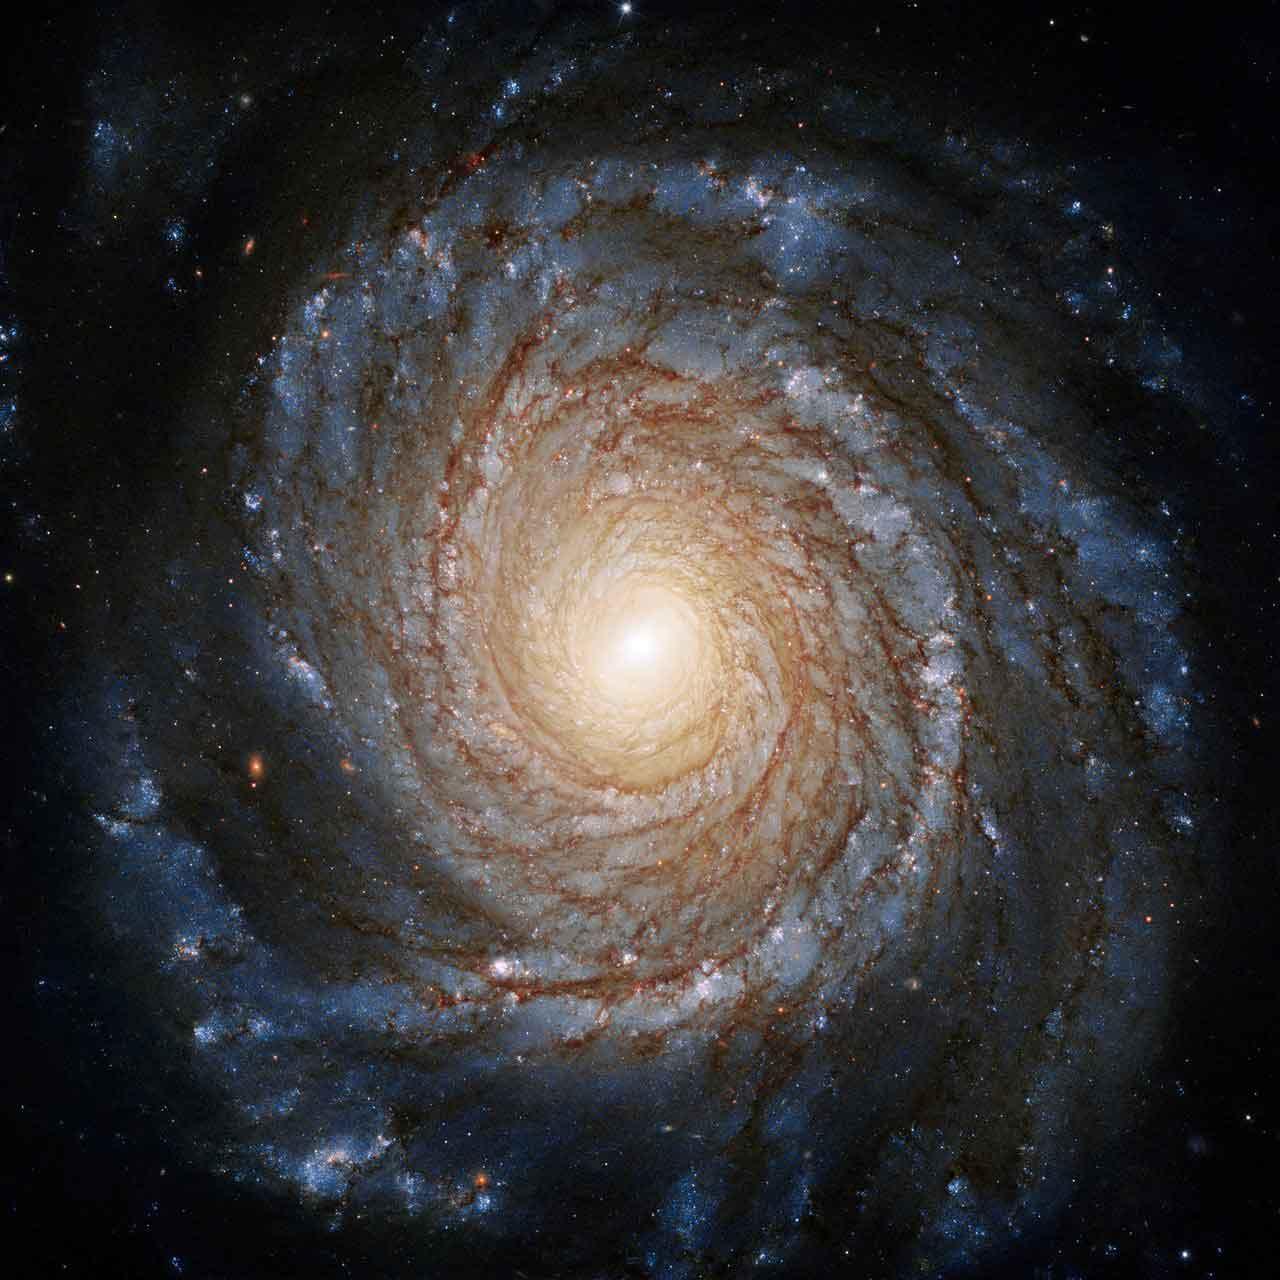 Galaxy NGC 3147